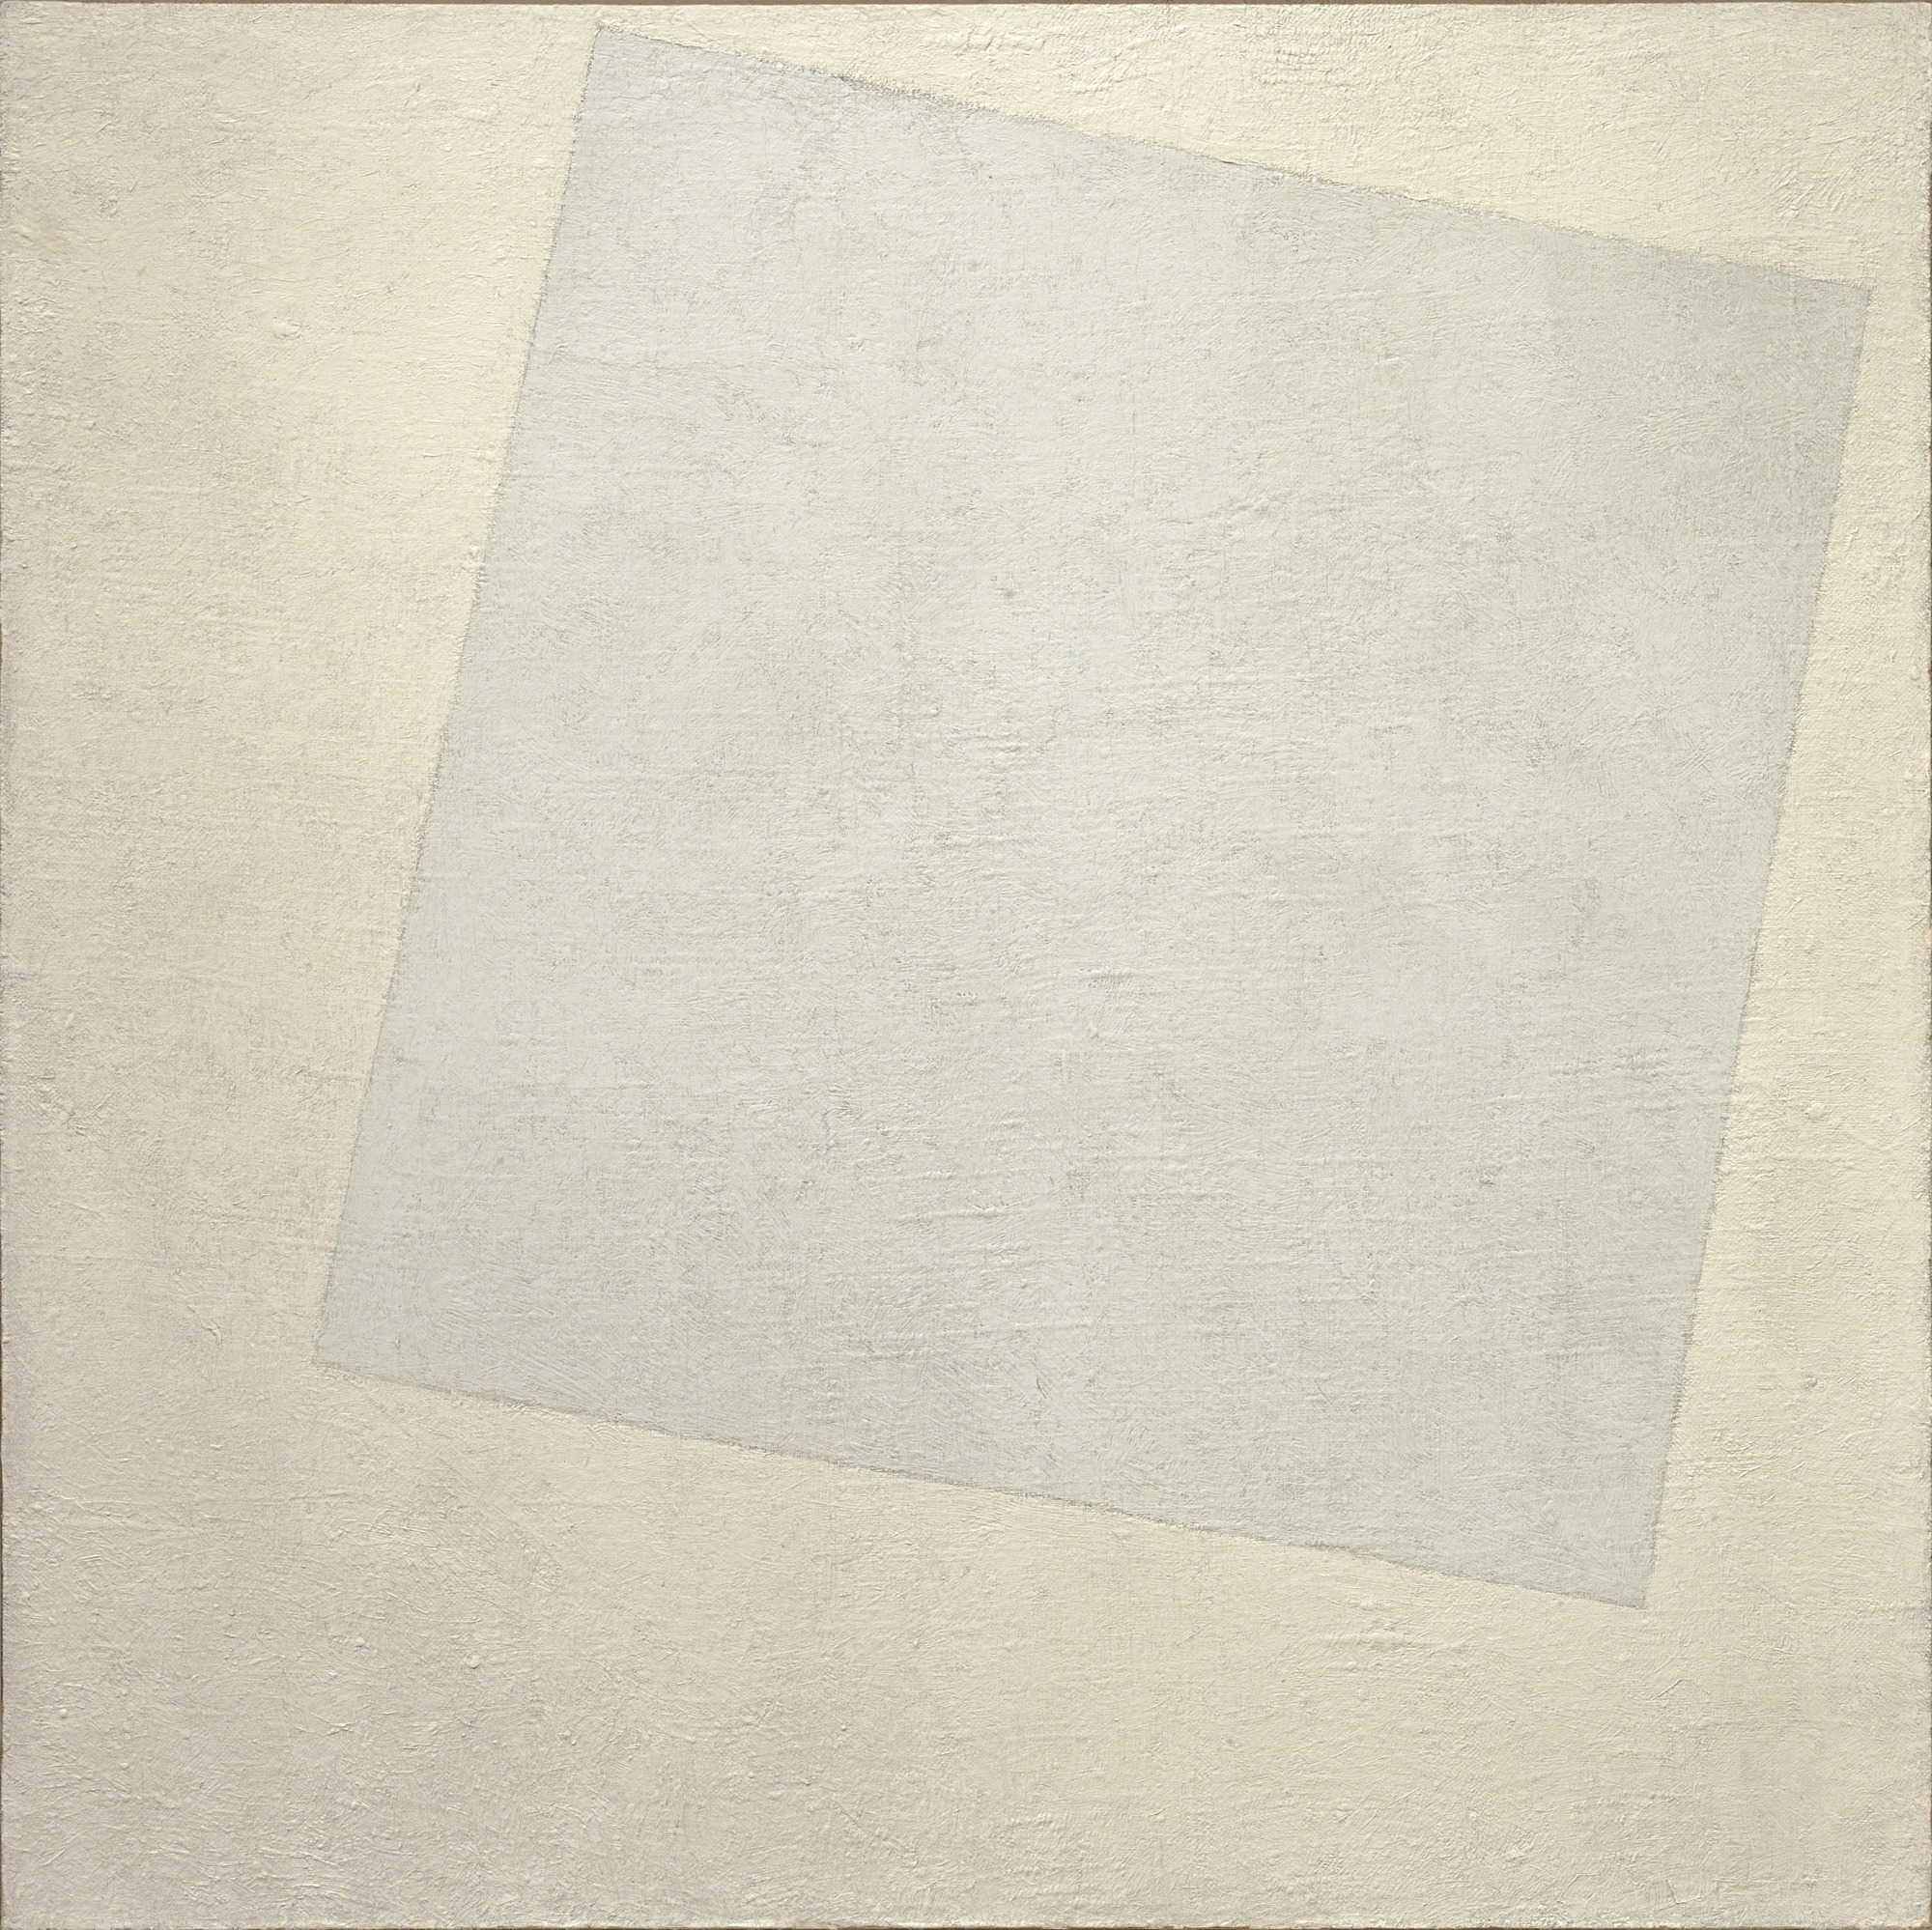 White x 2